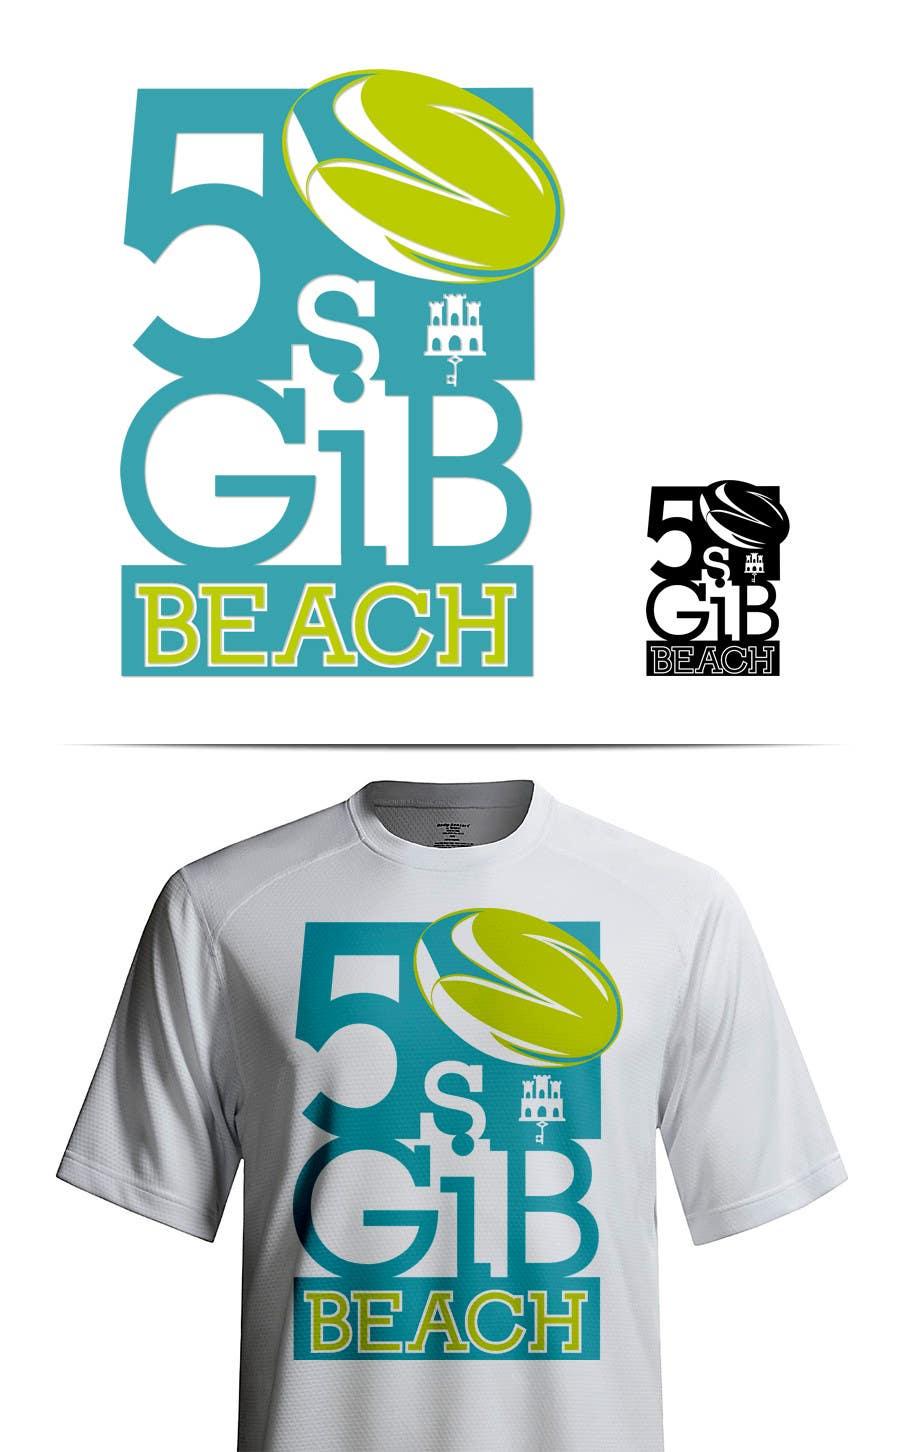 Kilpailutyö #7 kilpailussa Design a Logo for Beach Rugby - Use your imagination!